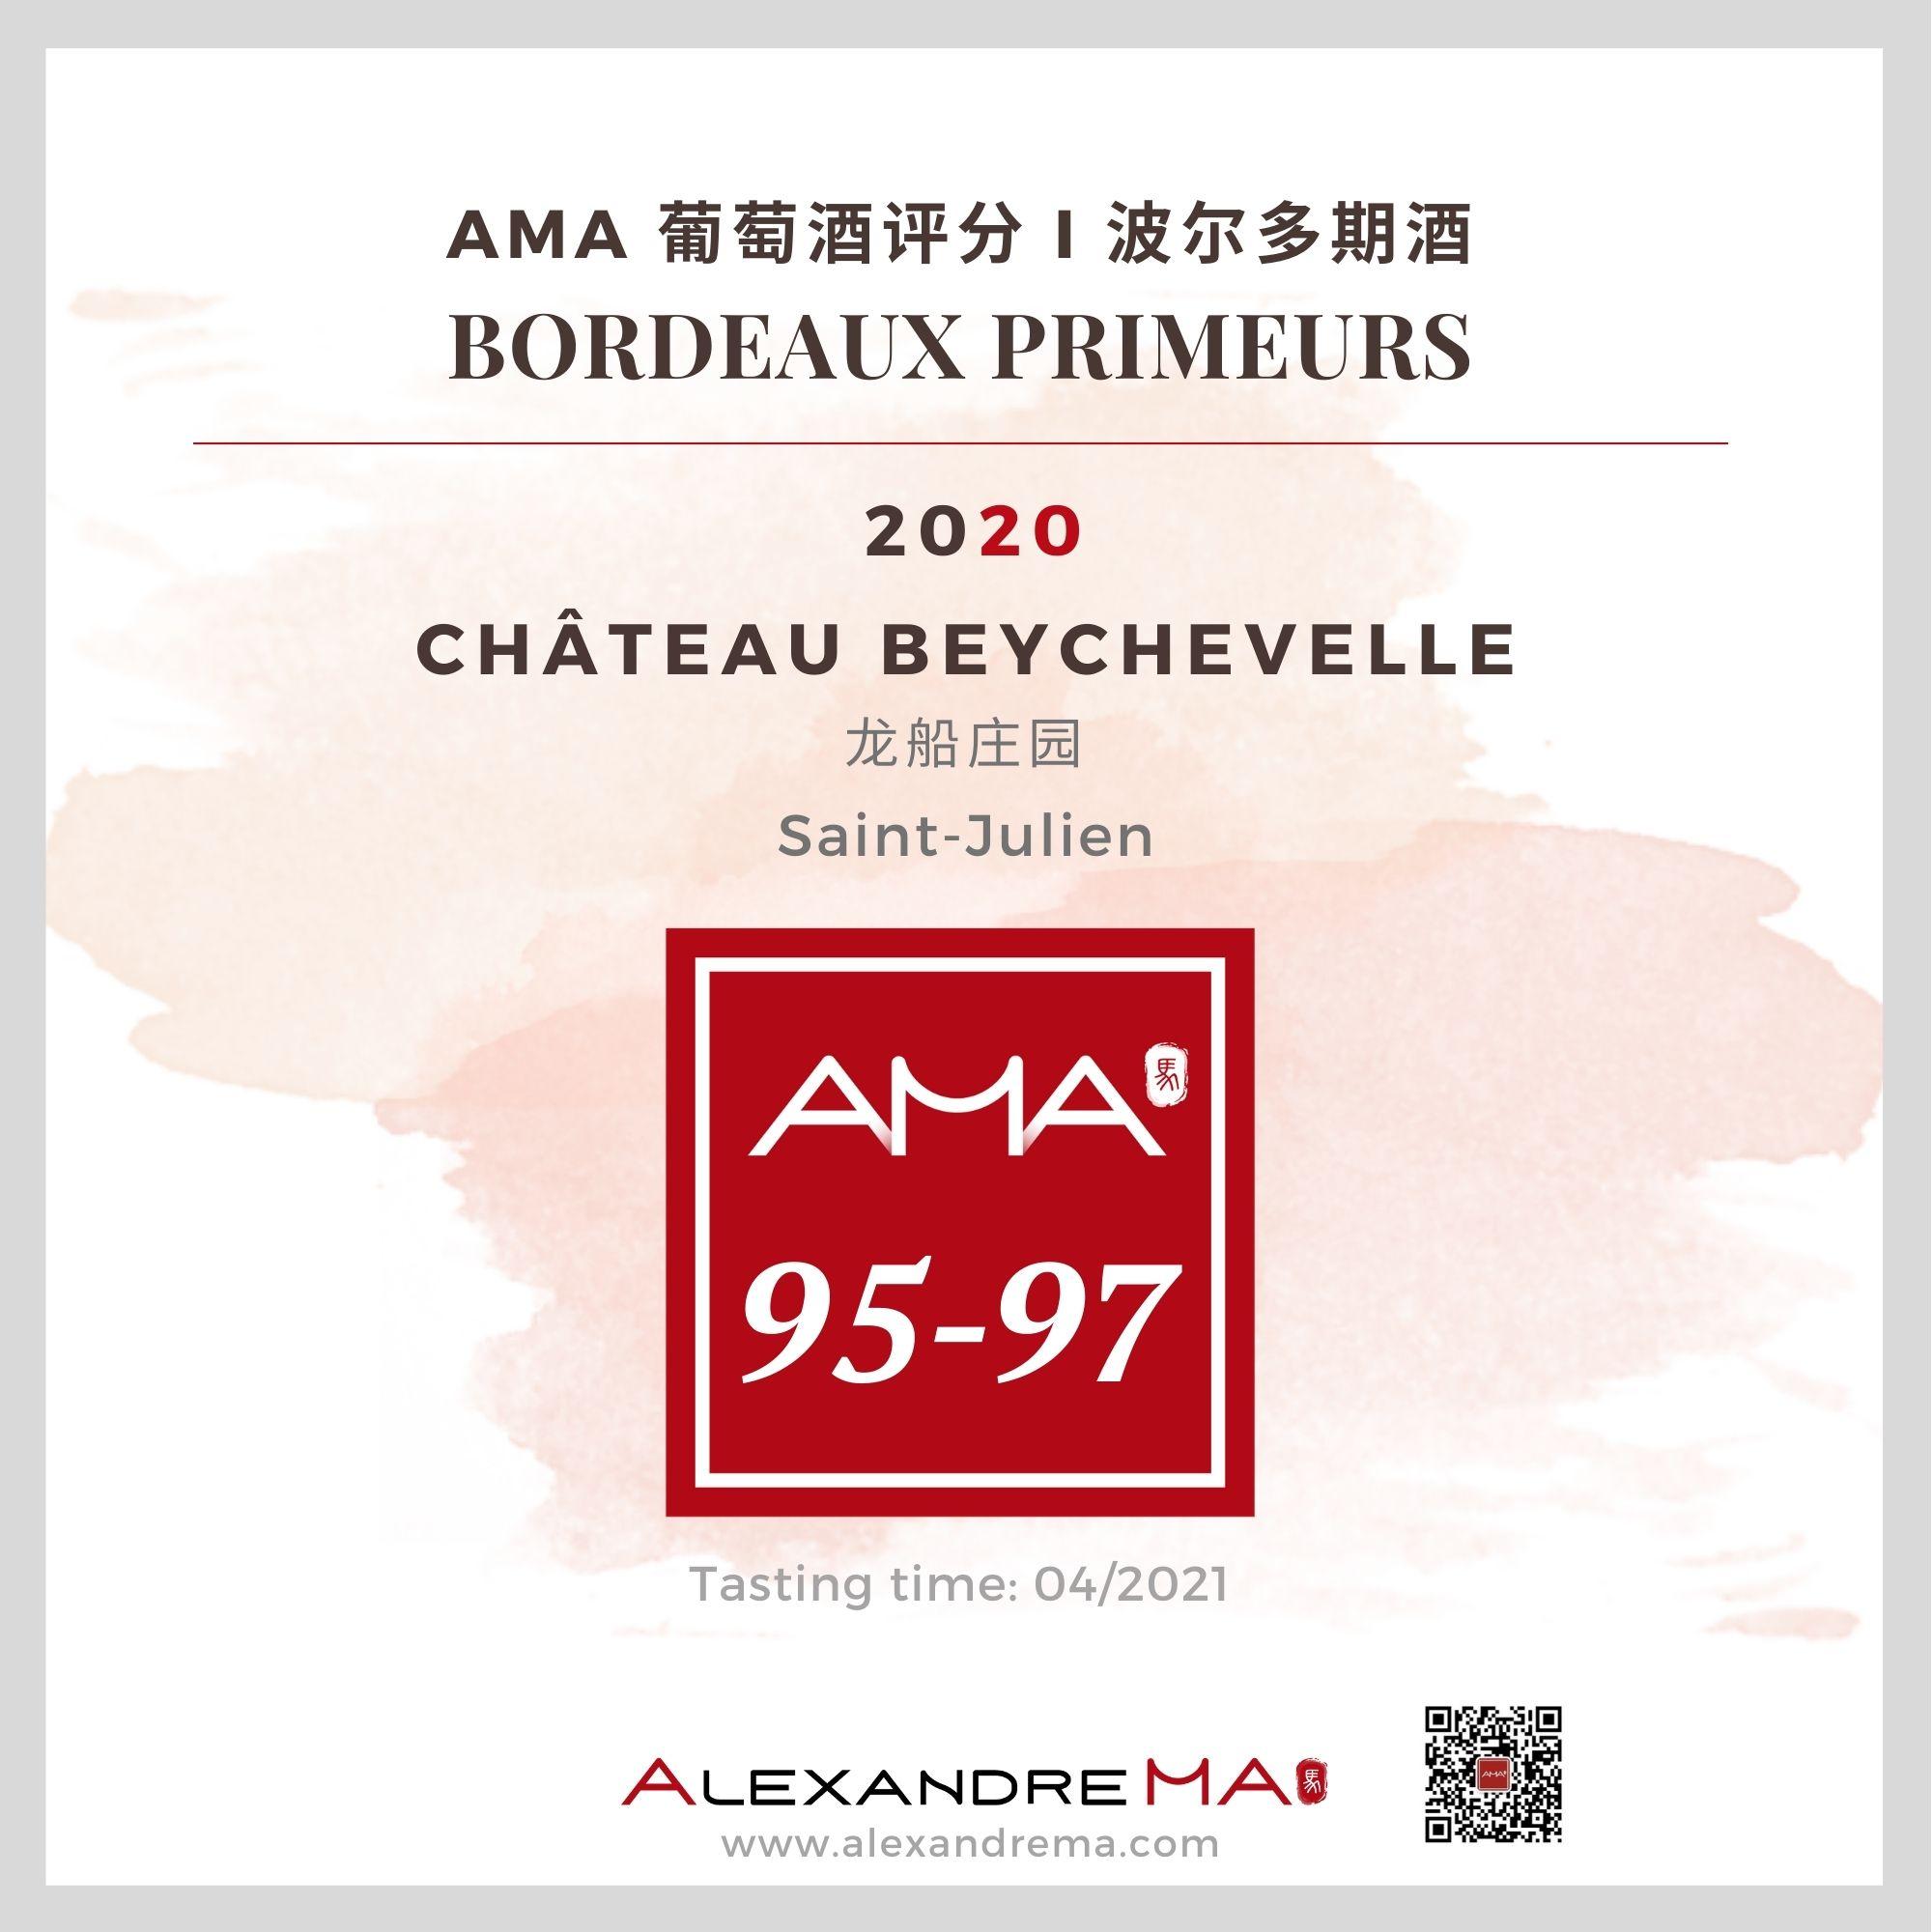 Château Beychevelle 2020 龙船庄园 - Alexandre Ma